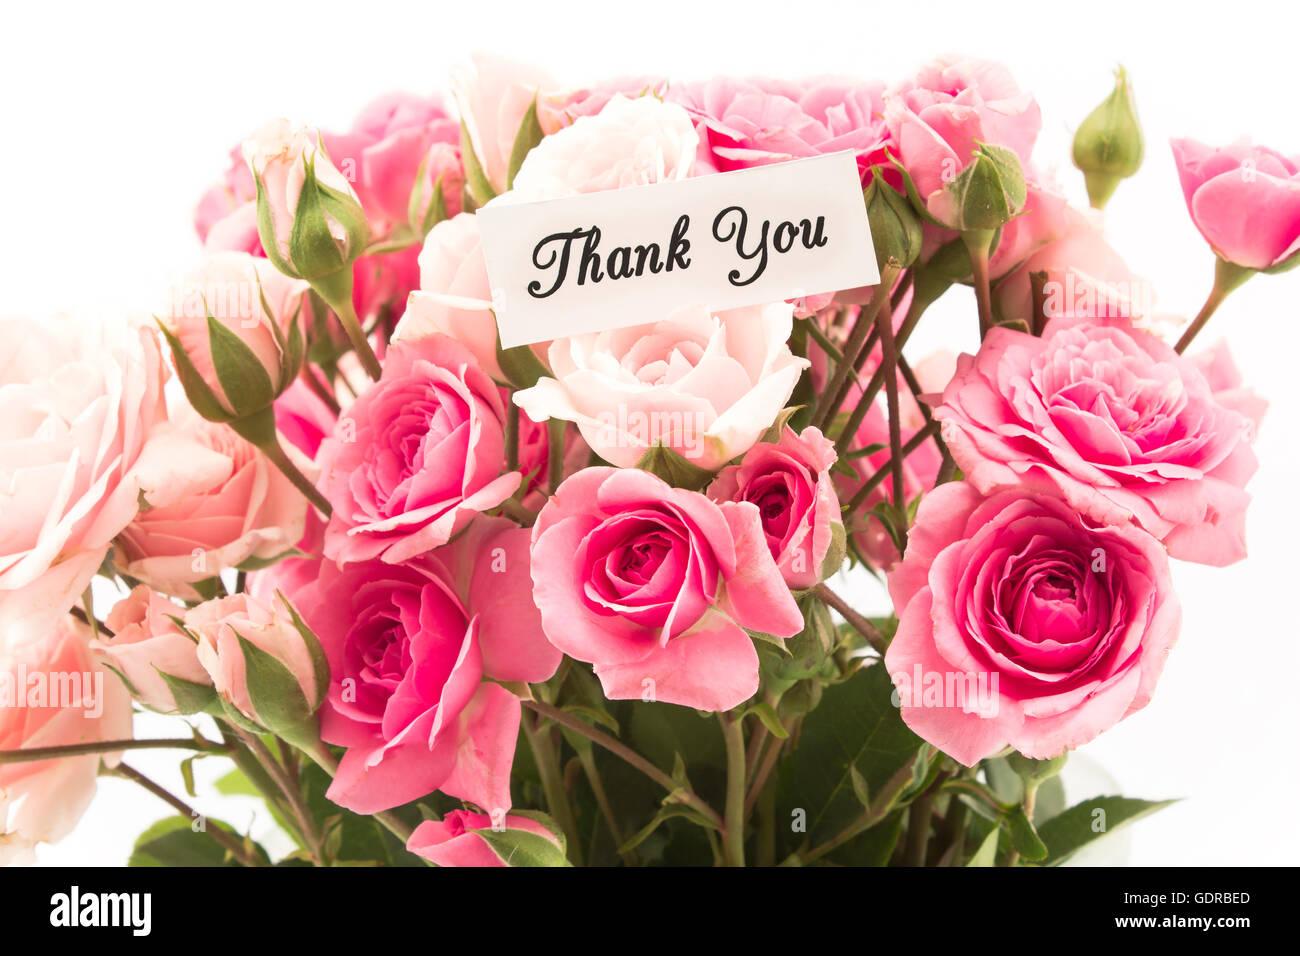 Dankeschön-Karte mit rosa Rosen-Bouquet. Stockbild